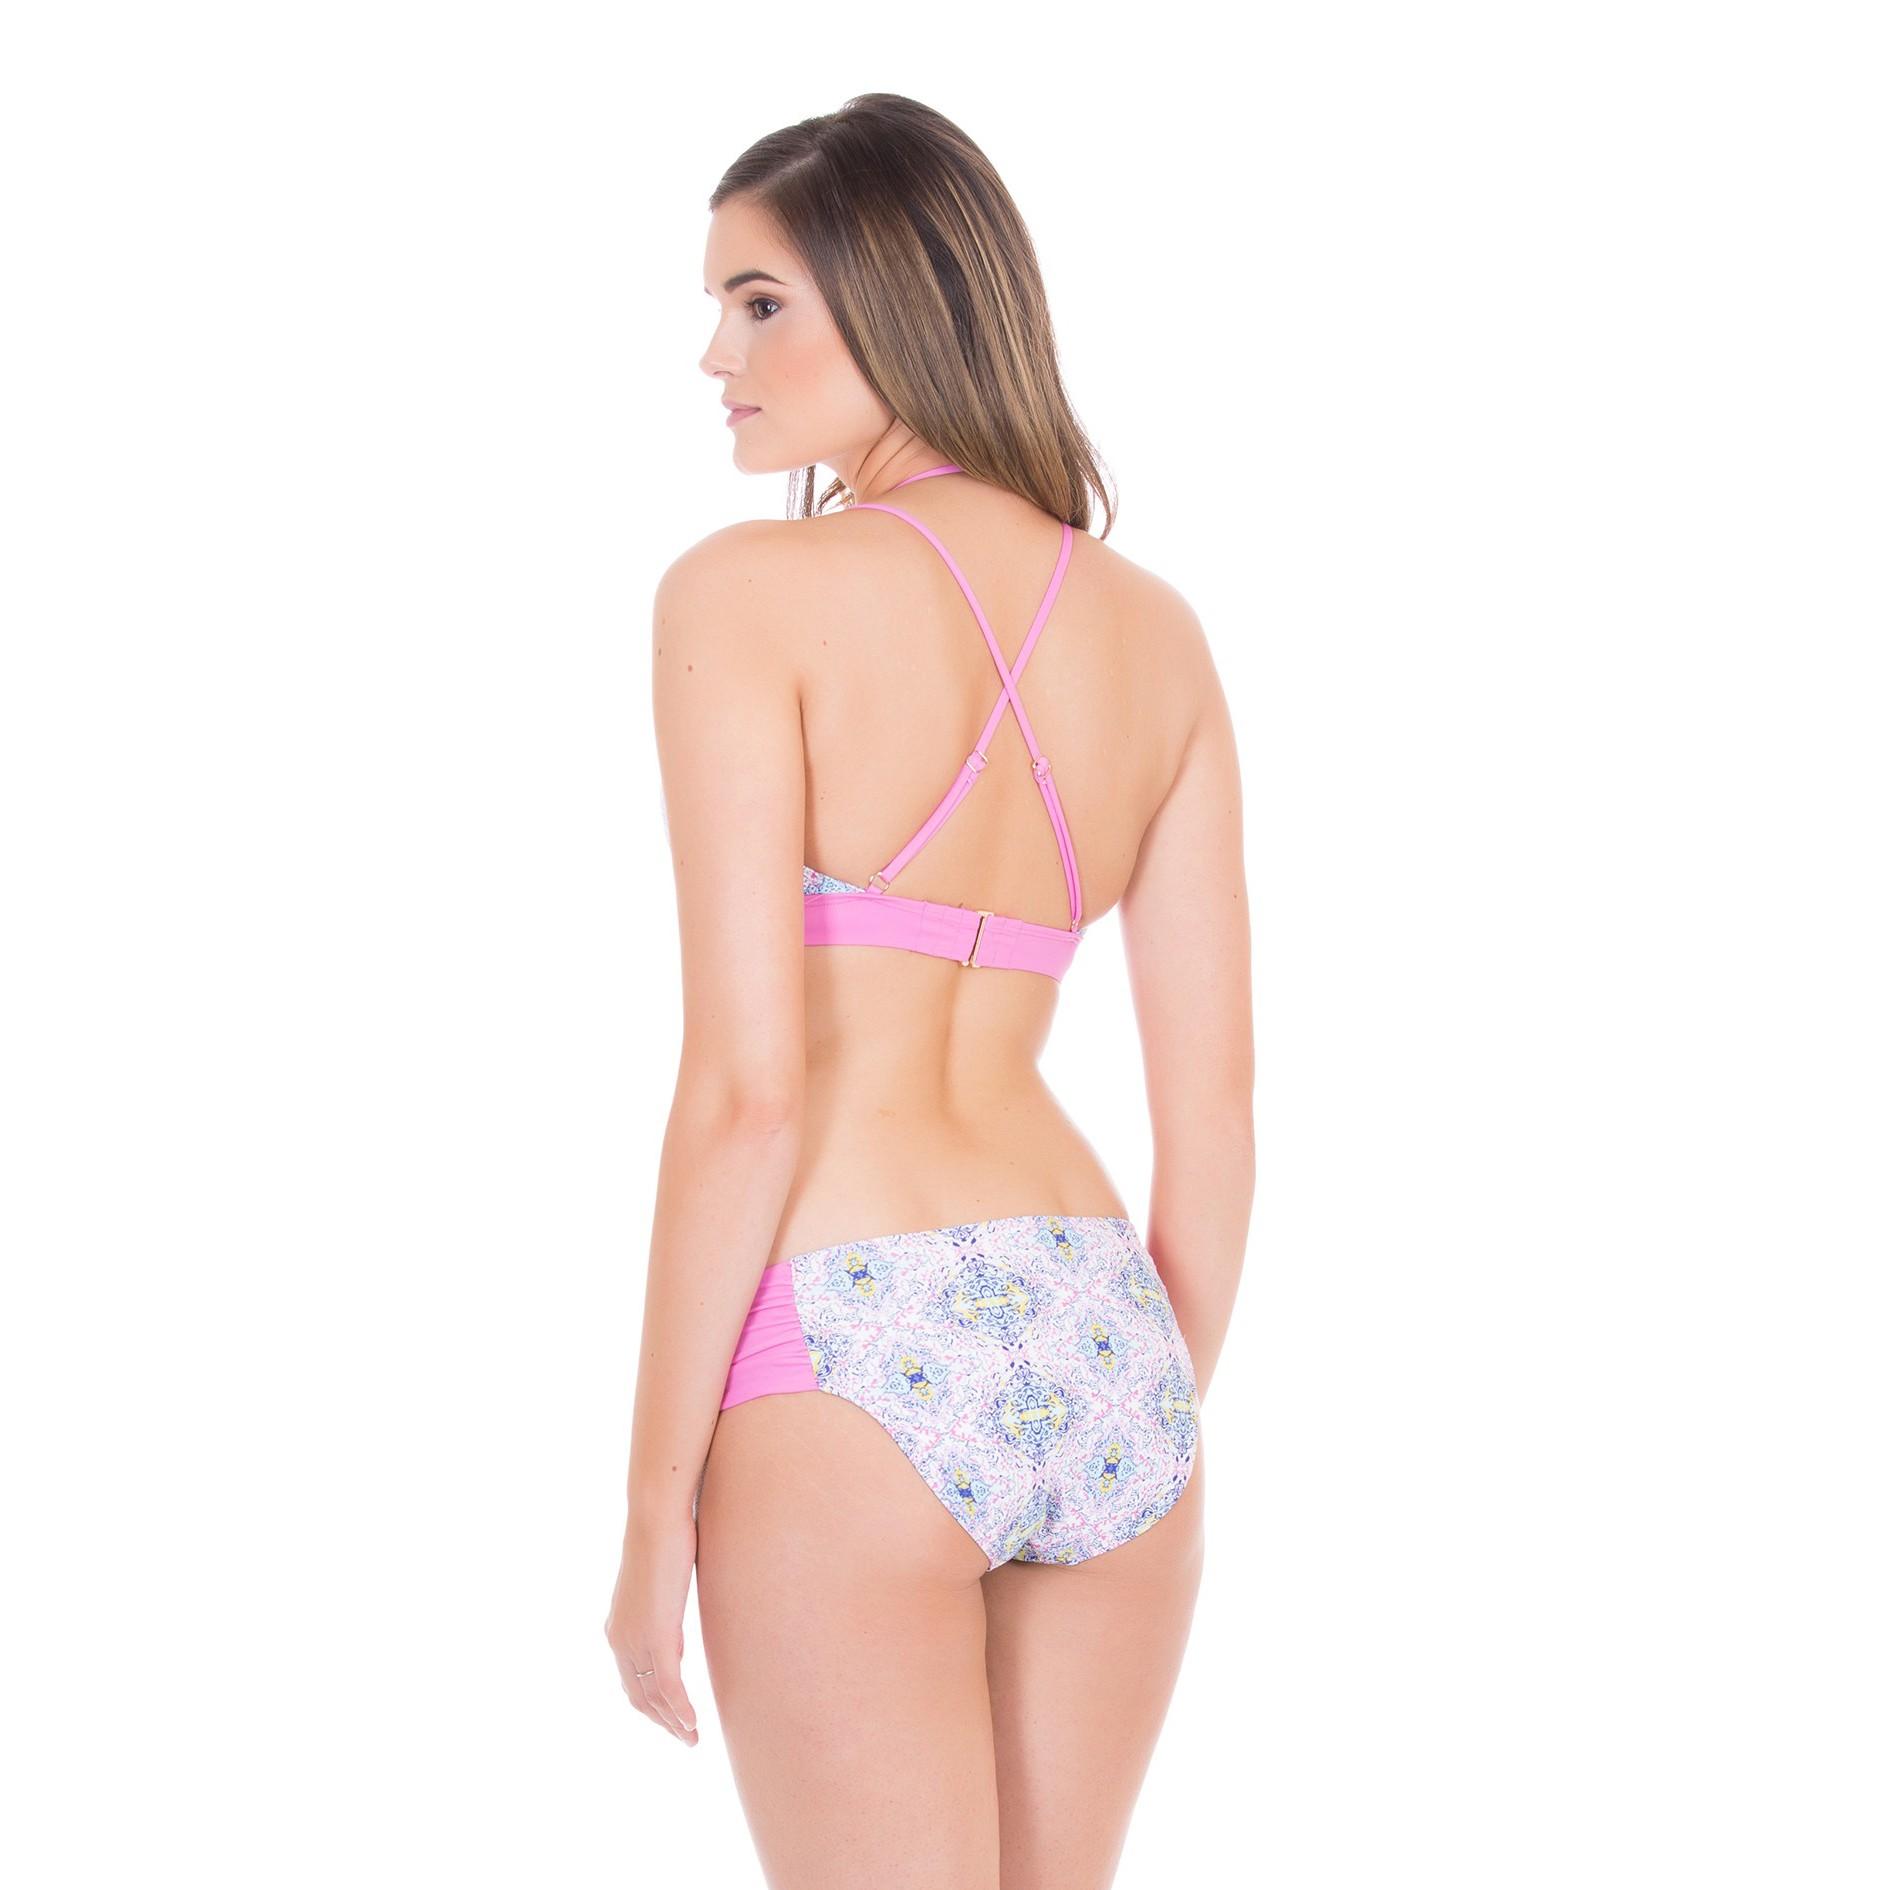 Cabana Life Side Ruched +50 UV Bikini Bottom (Women's)